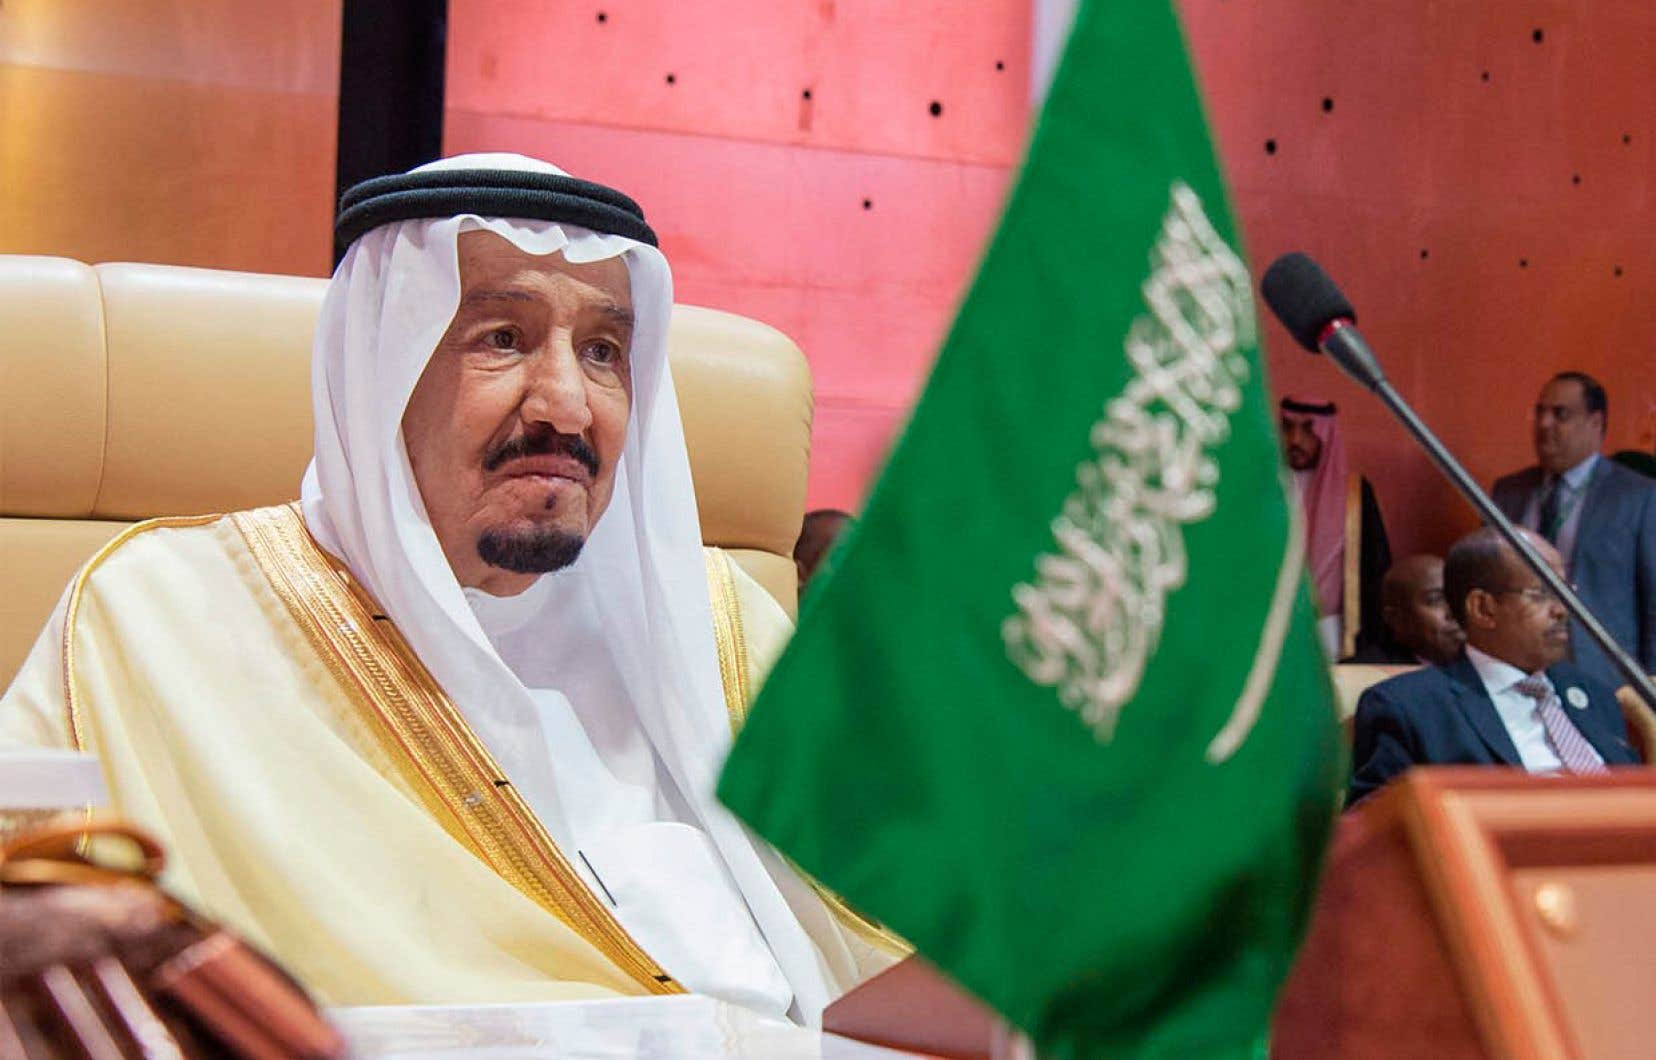 Le roi de l'Arabie Saoudite, Salam al-Saud